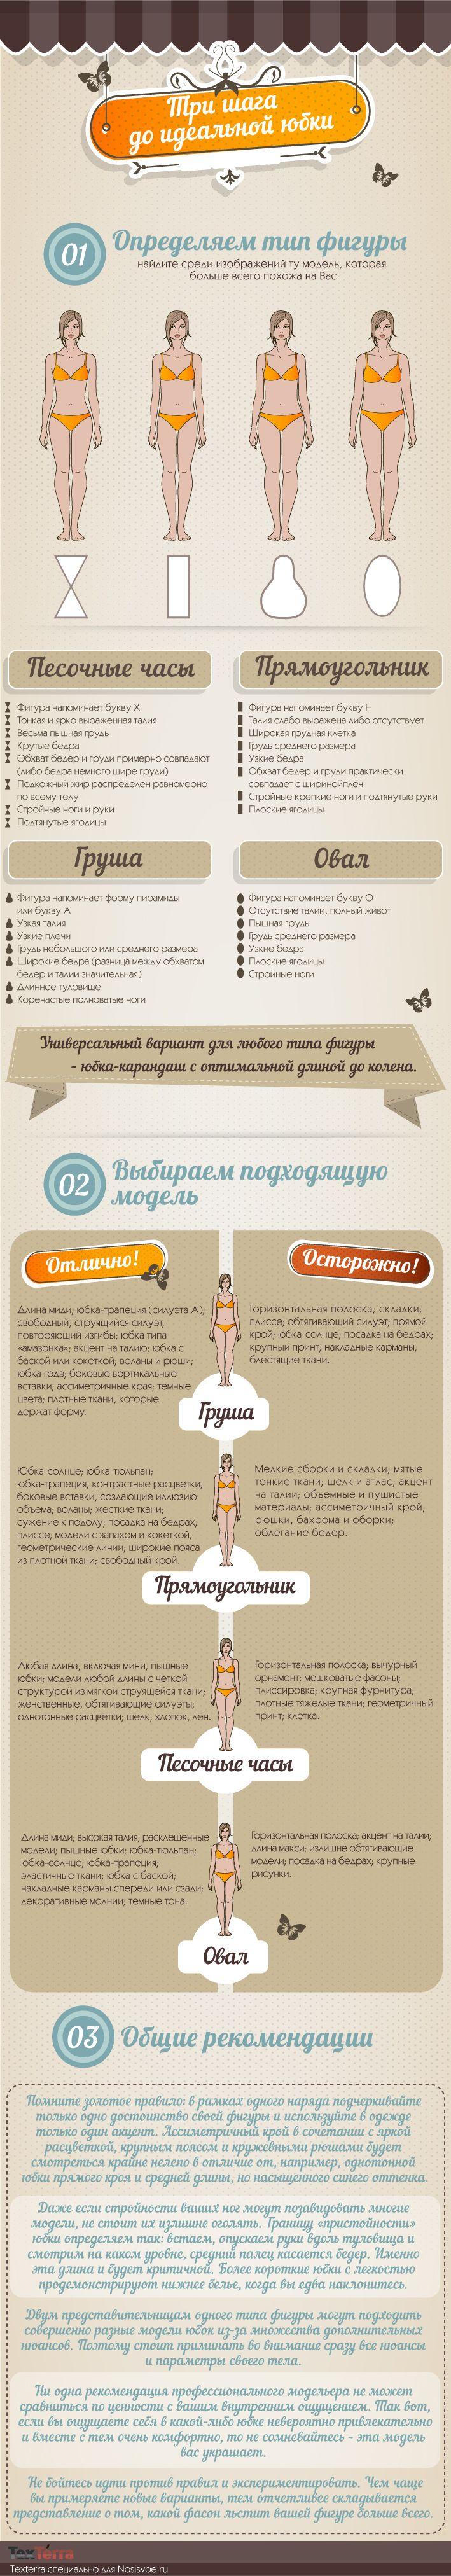 Три шага до идеальной юбки, http://www.nosisvoe.ru/blog/Tri-shaga-do-idealnoj-yubki